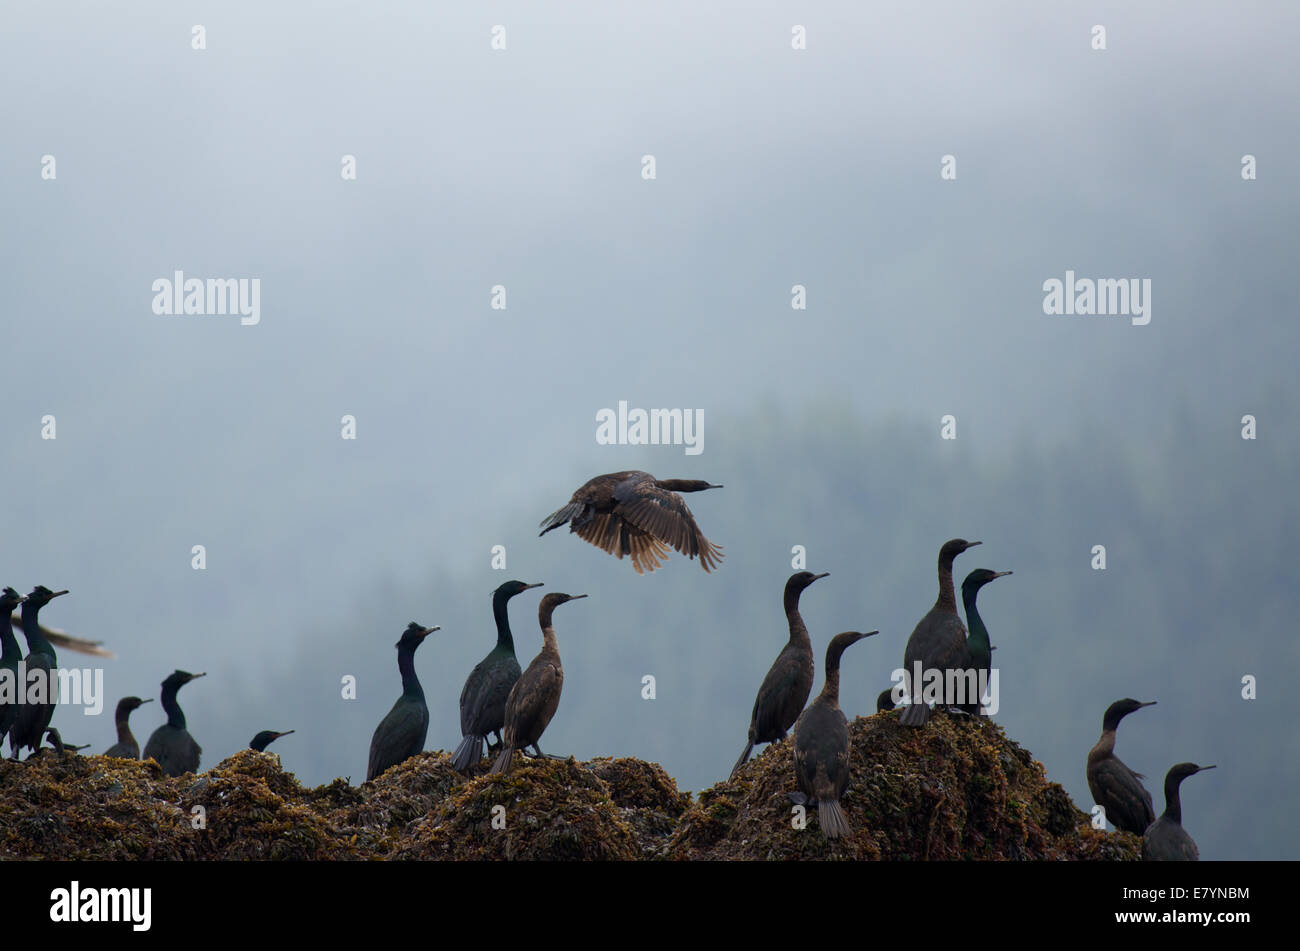 Pelagic Cormorants (Phalacrocorax pelagicus) in the Inian Islands in Tongass National Forest, Alaska. - Stock Image